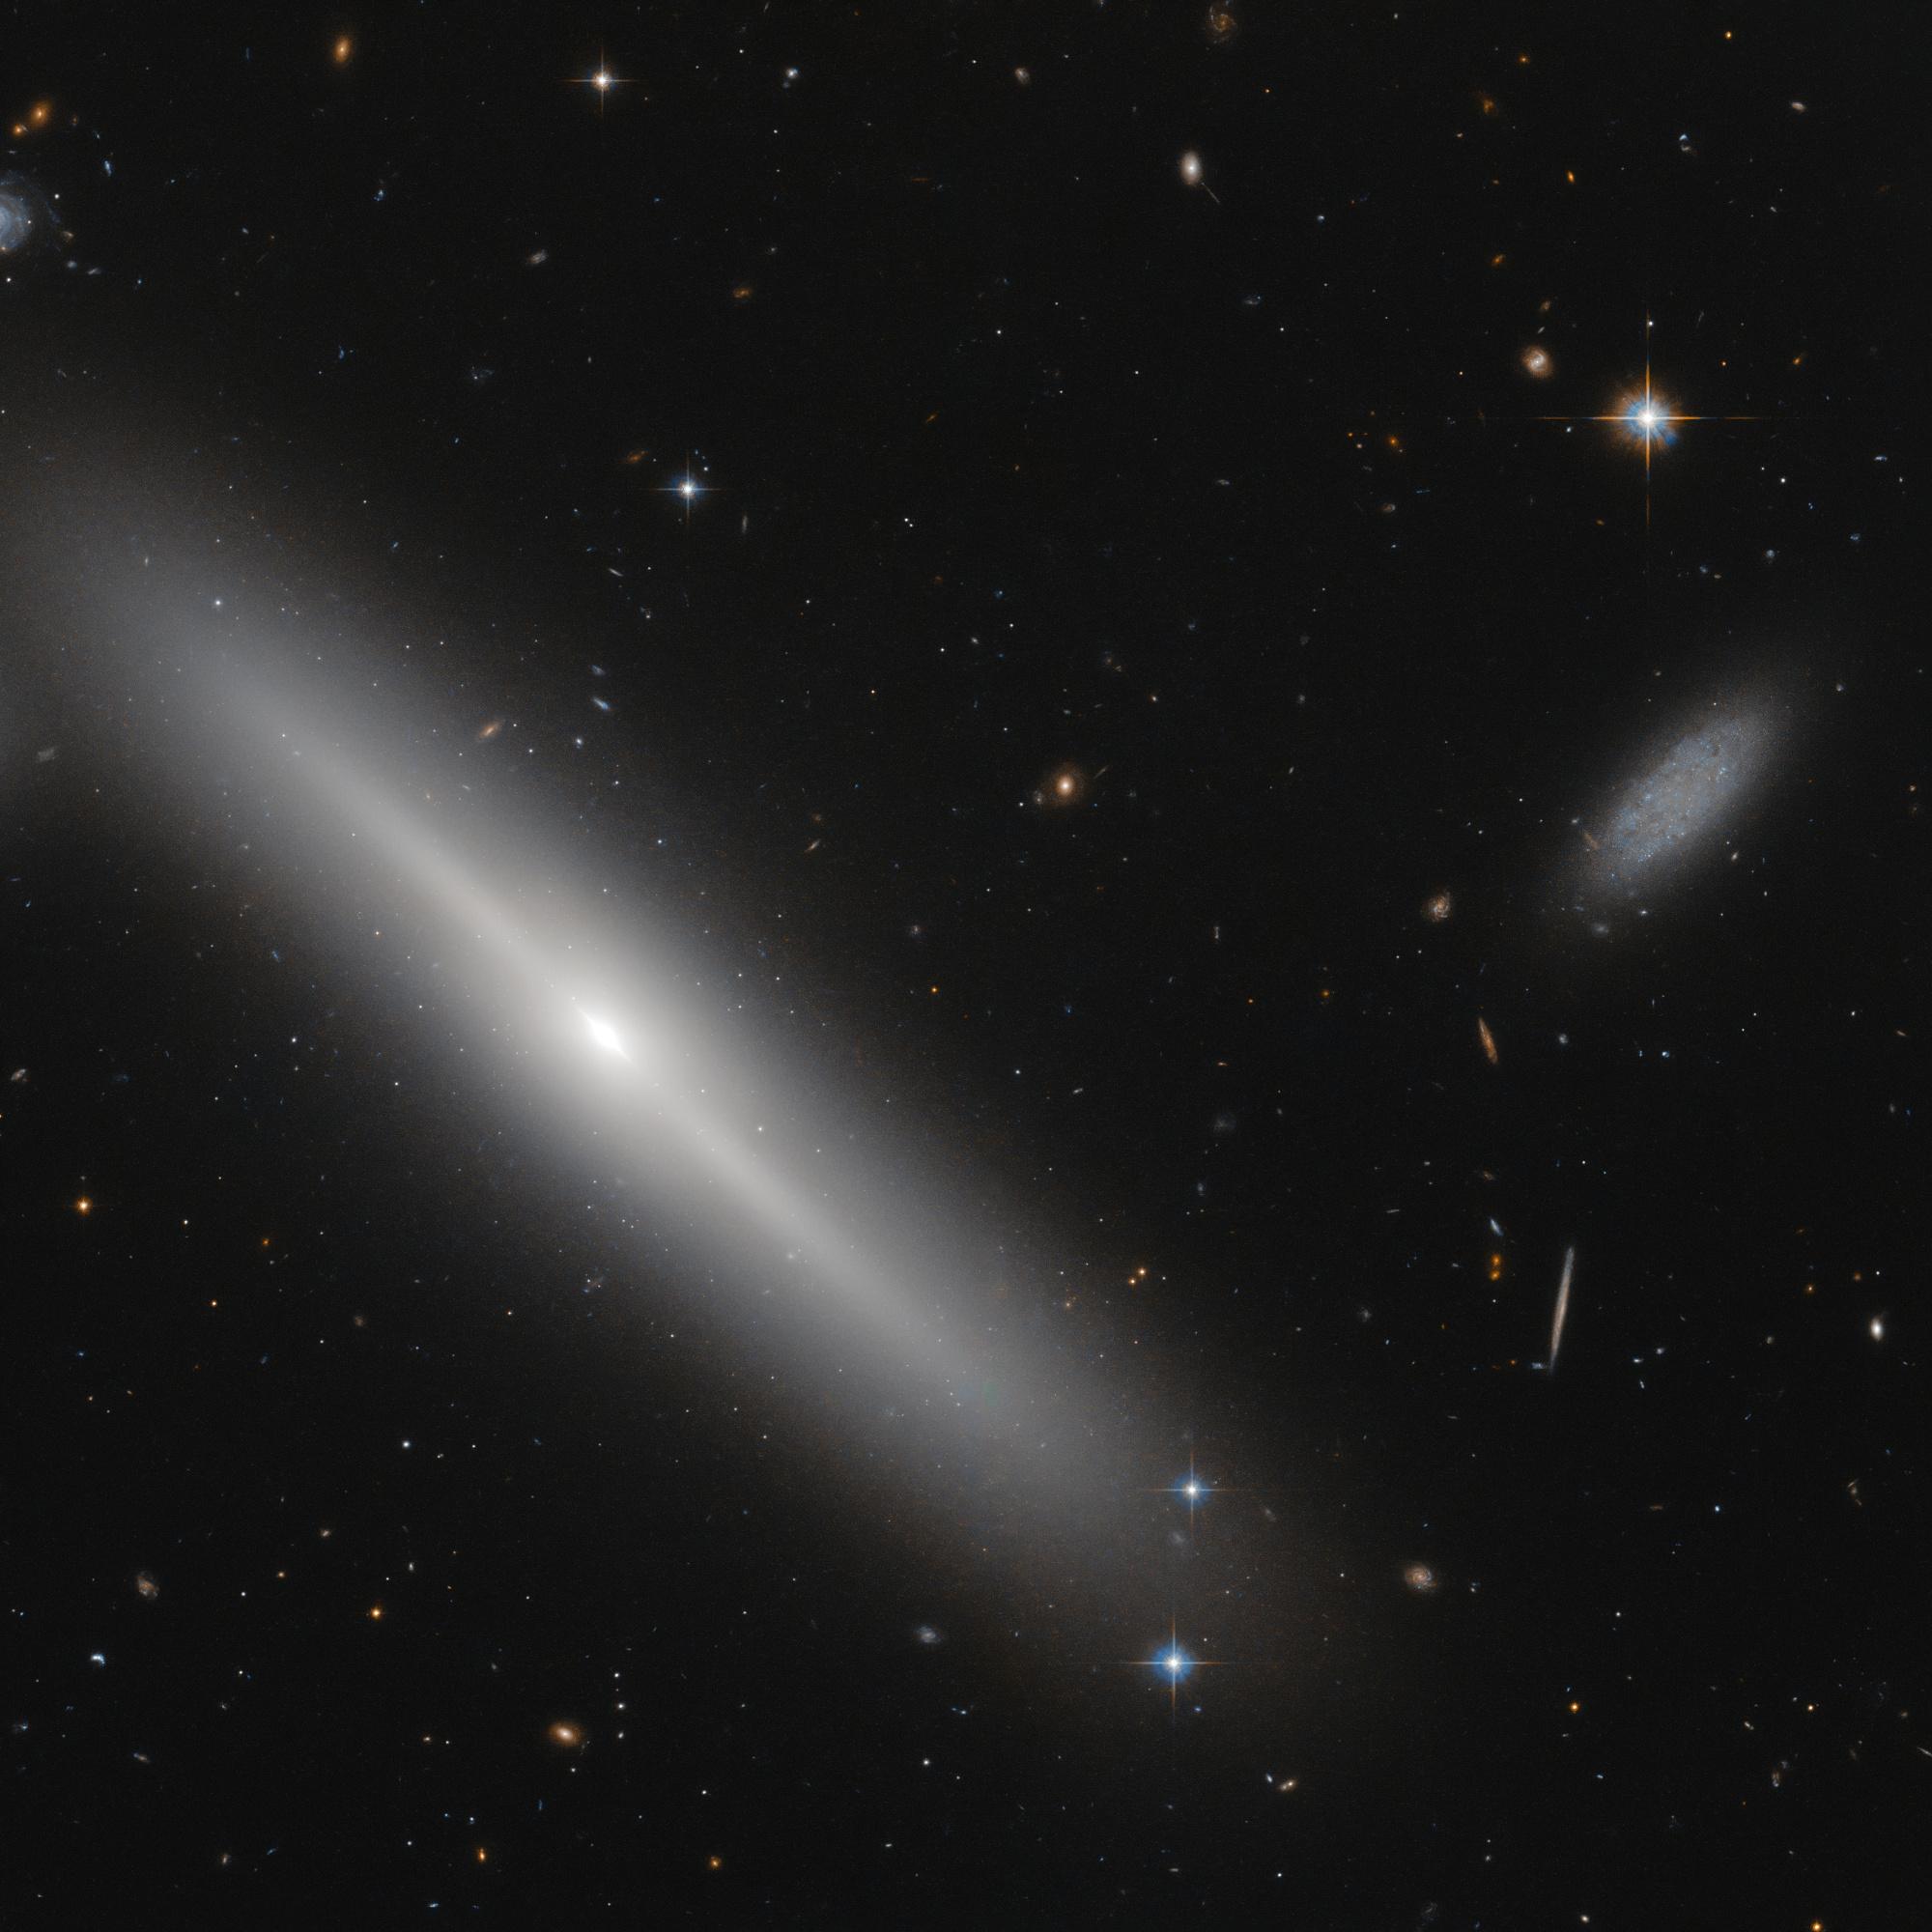 Image credit: ESA/Hubble & NASA. Acknowledgement: JudySchmidt.